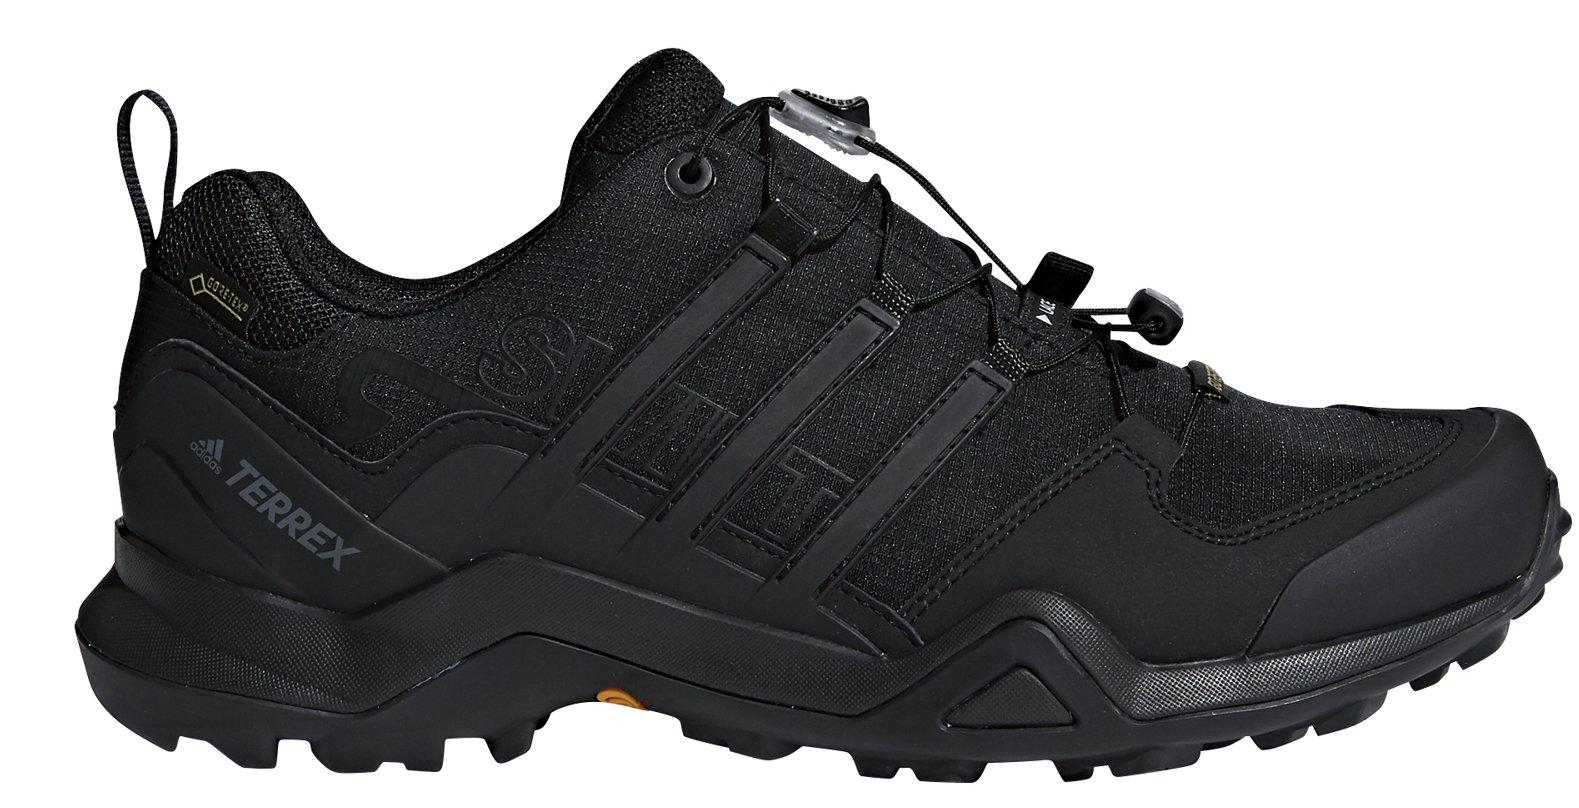 Adidas Terrex Swift R2 Gtx M 48 EUR